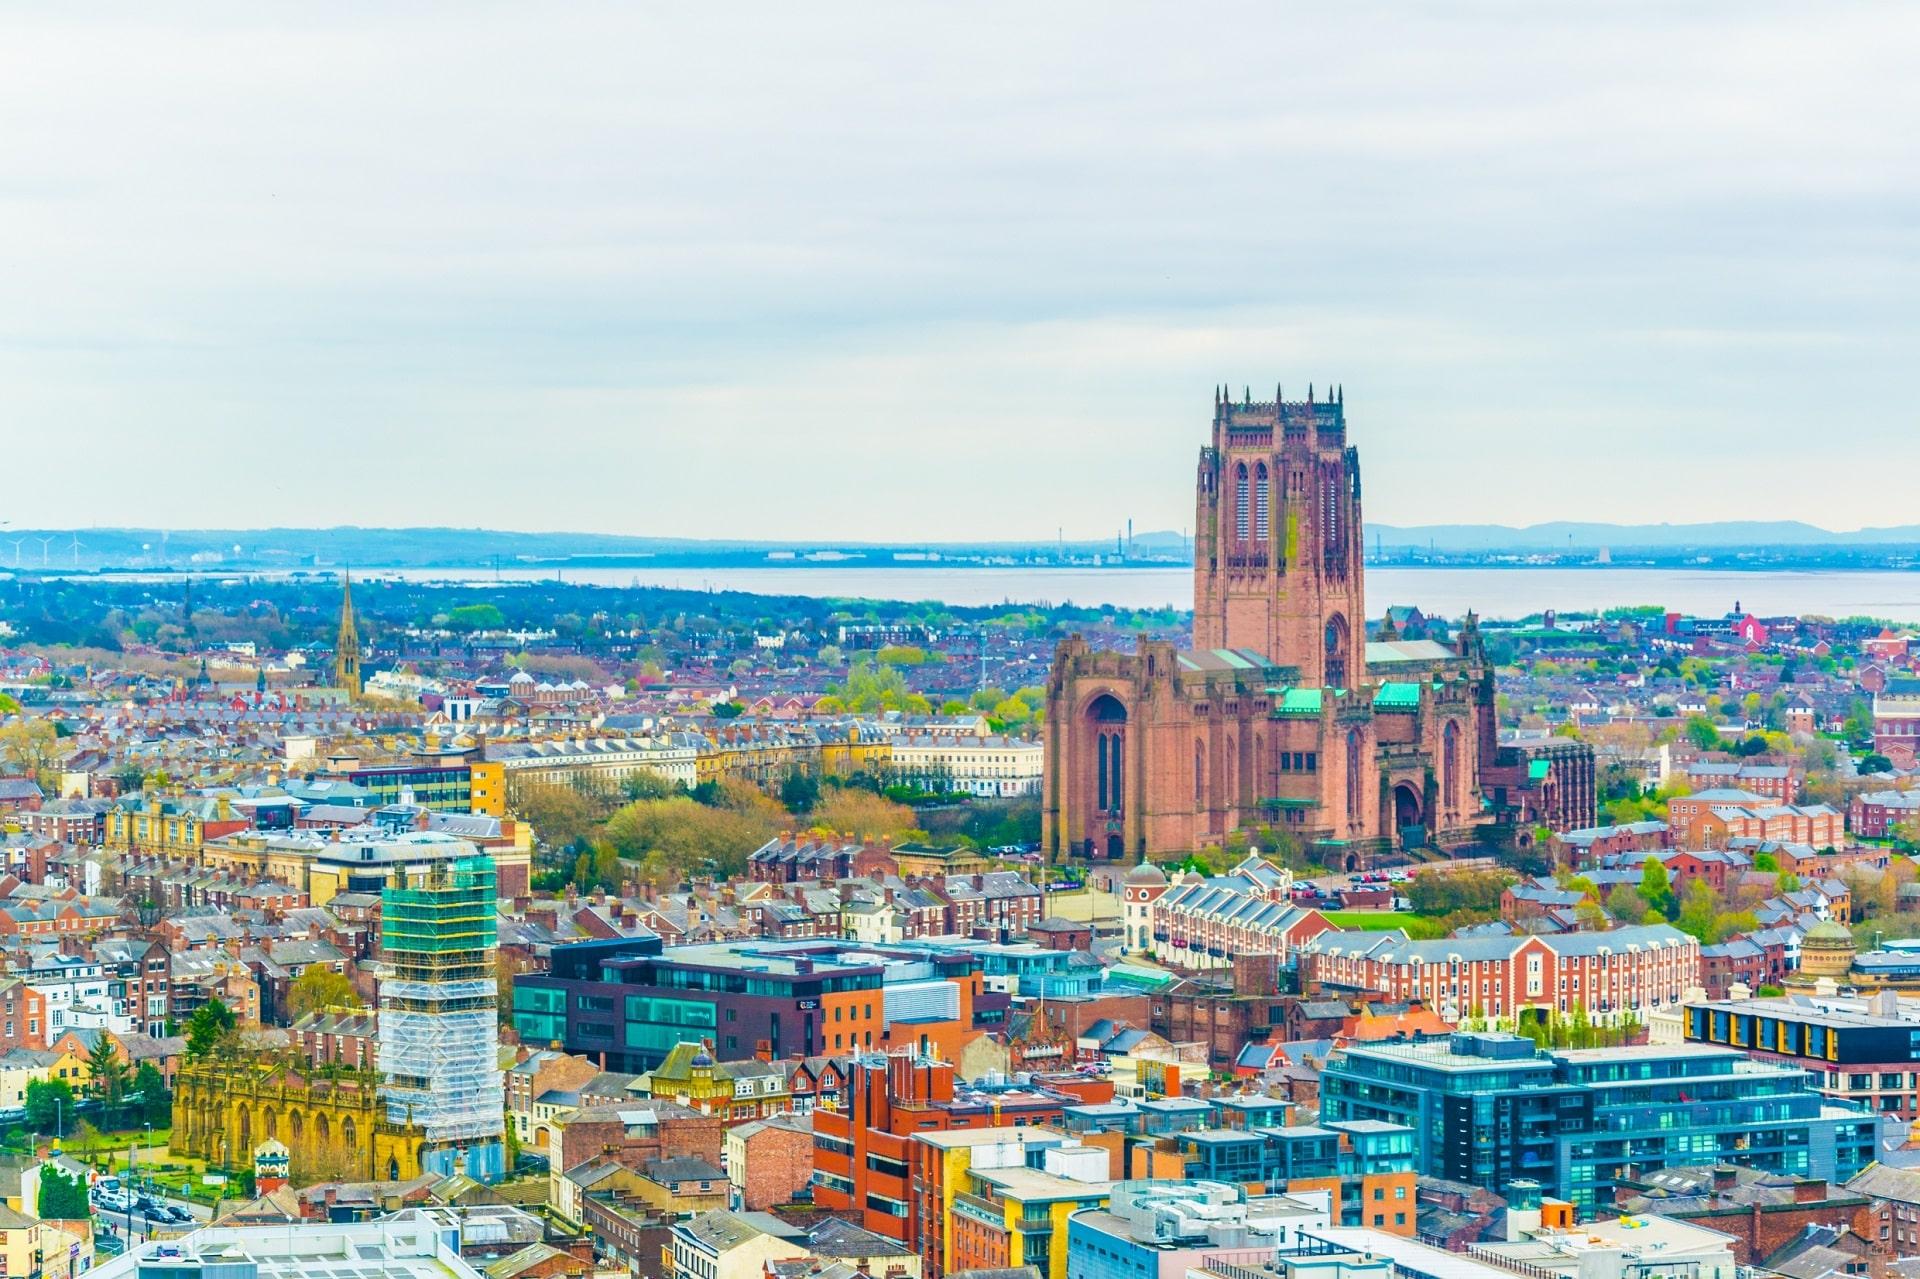 Liverpool-UK-Aerial